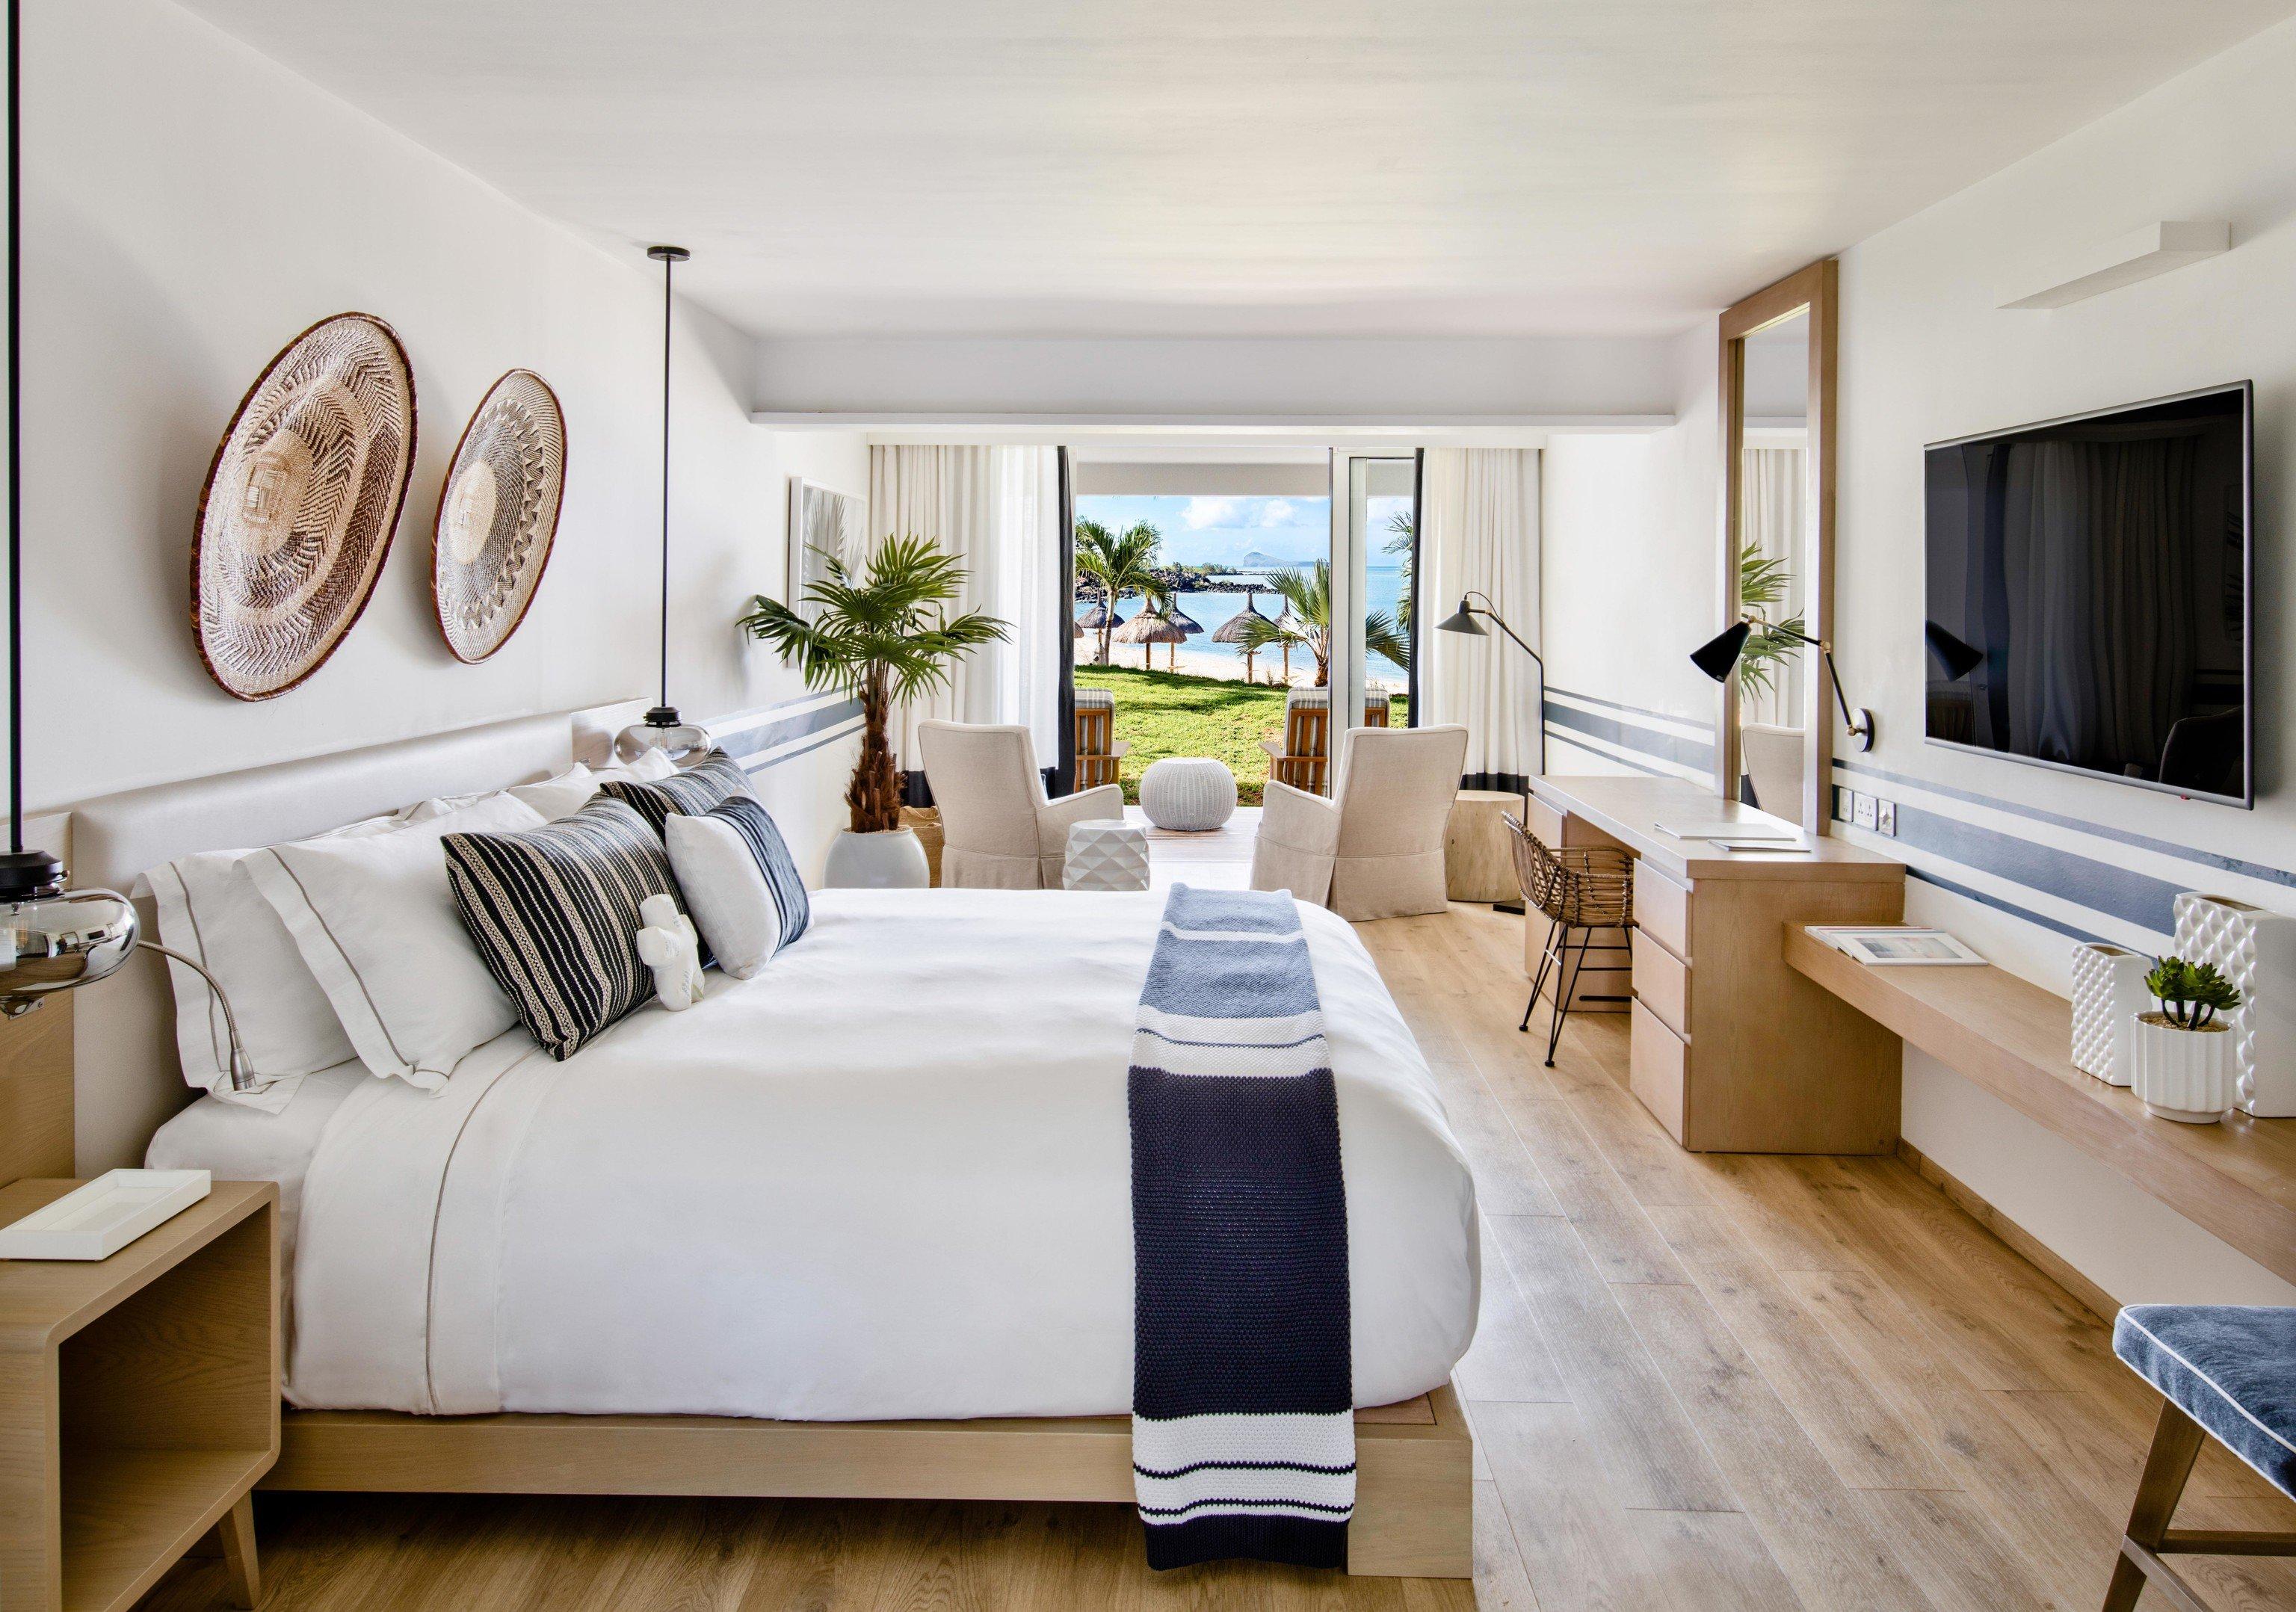 Health + Wellness Hotels Luxury Travel living room Suite white home Bedroom interior designer penthouse apartment flat